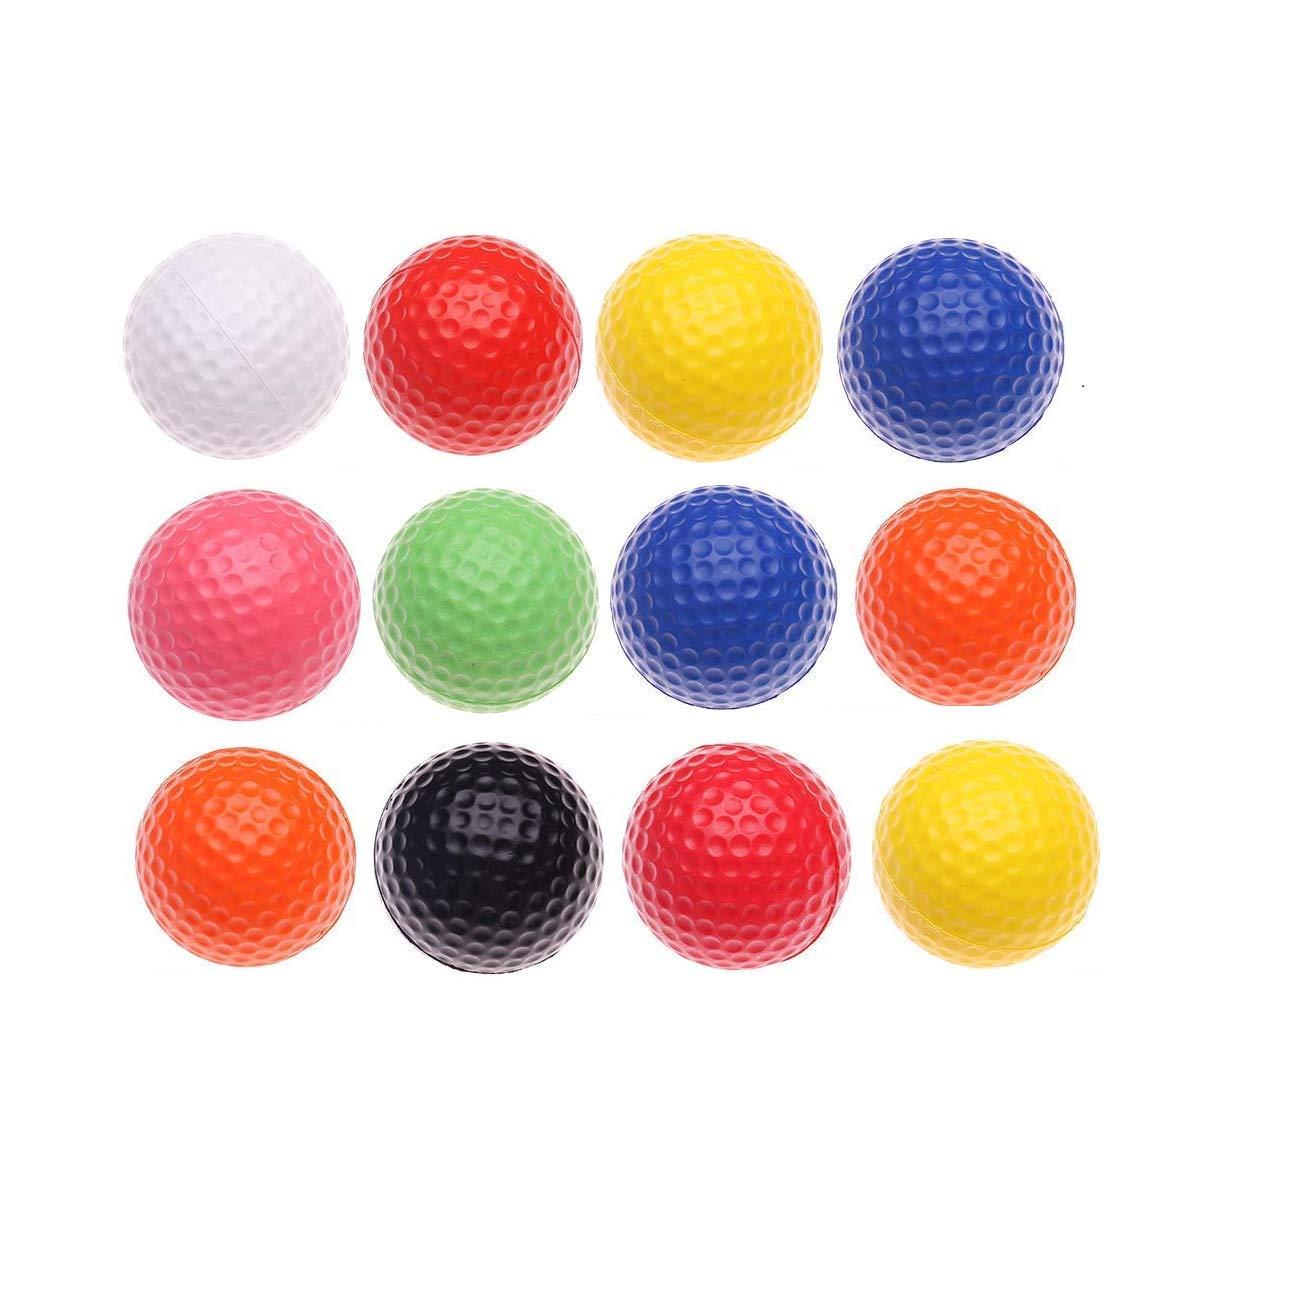 Fanovo Foam Golf Balls - Practice Golf Balls - Kid Golf Balls - Pet Balls, Light Soft Elastic Training Multifunction Sport Balls (12 Pack)